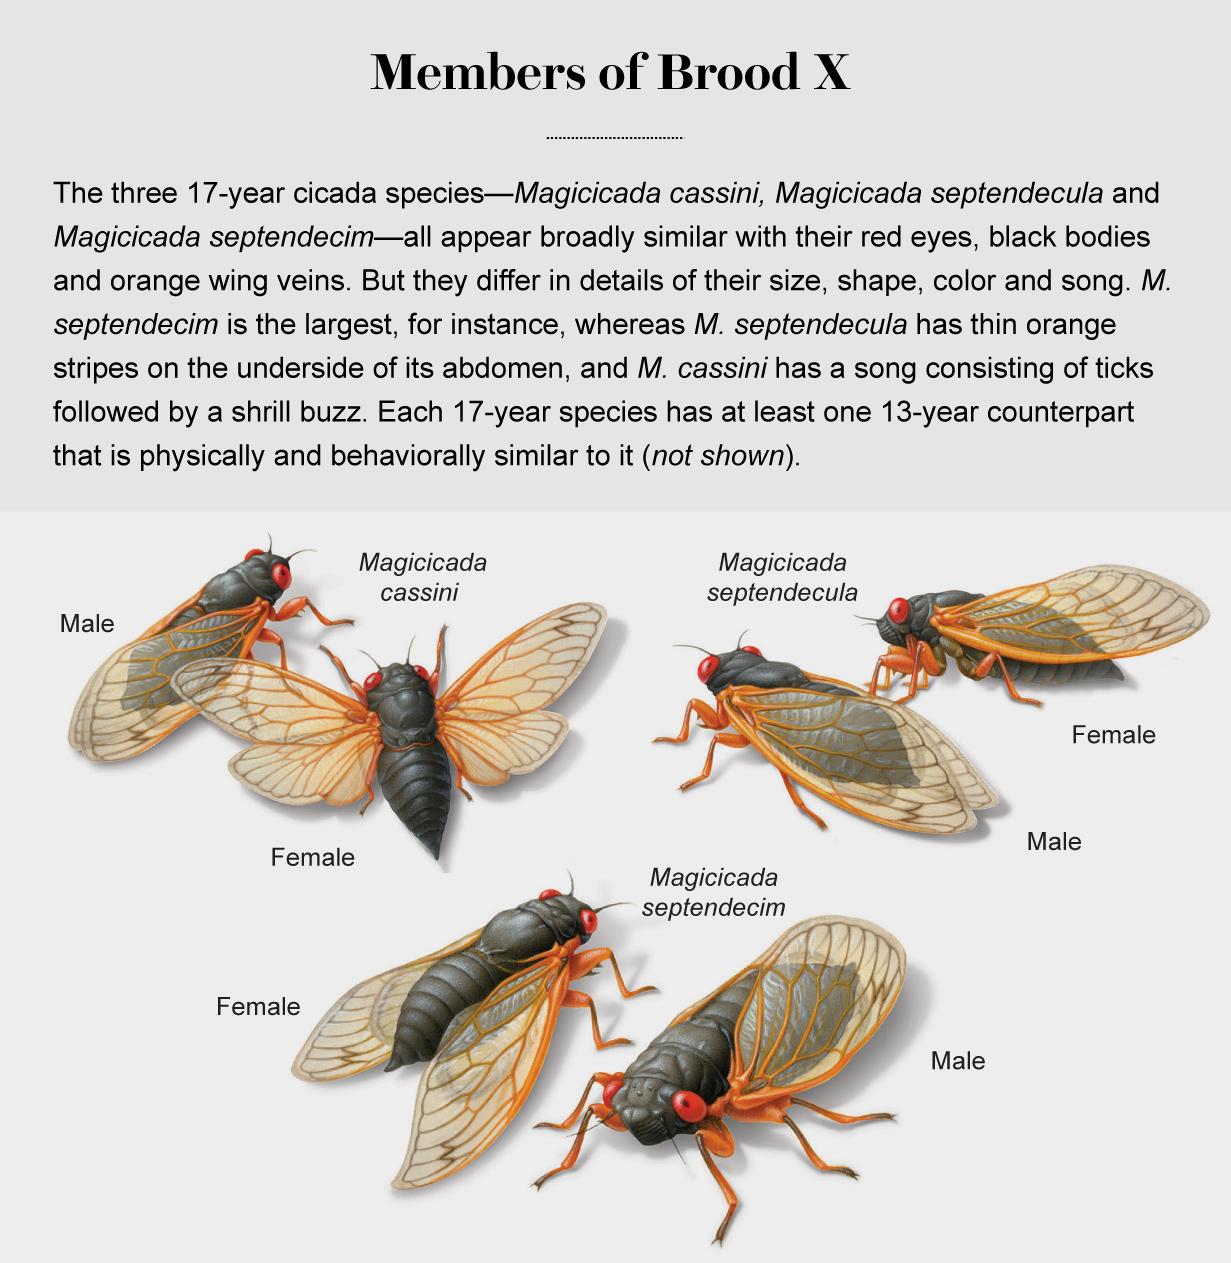 Illustrations show the three 17-year cicada species—Magicicada cassini, Magicicada septendecula and Magicicada septendecim.